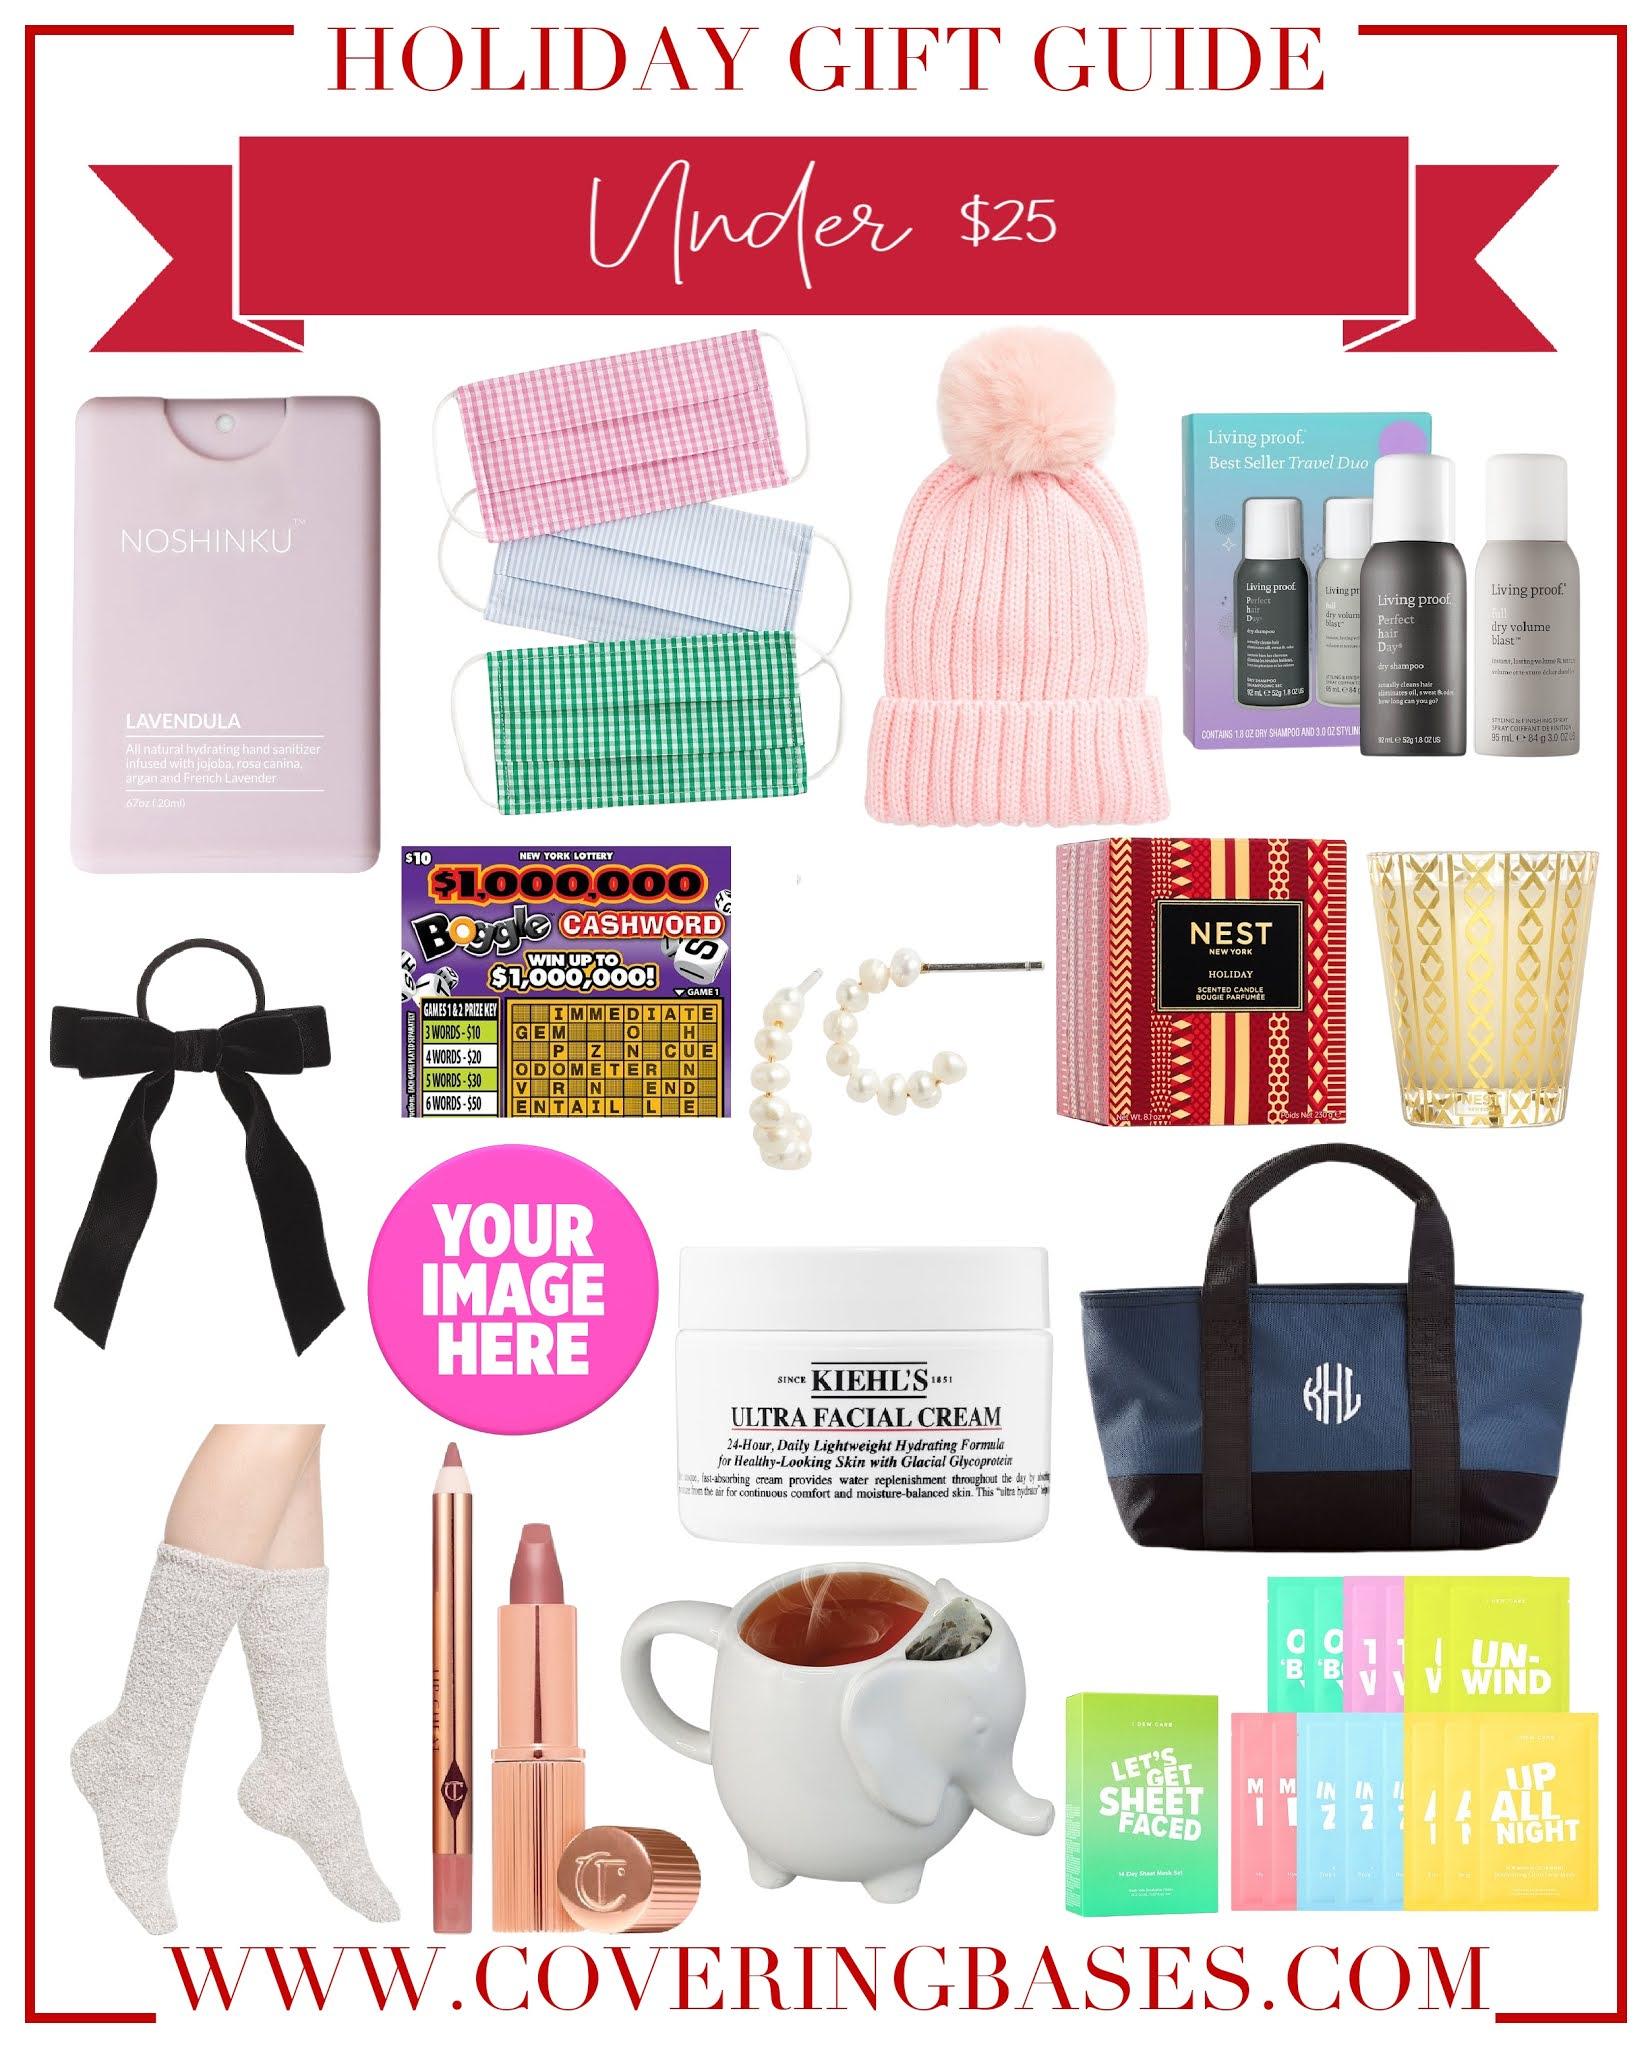 White Elephant: Under $25 Gift Guide